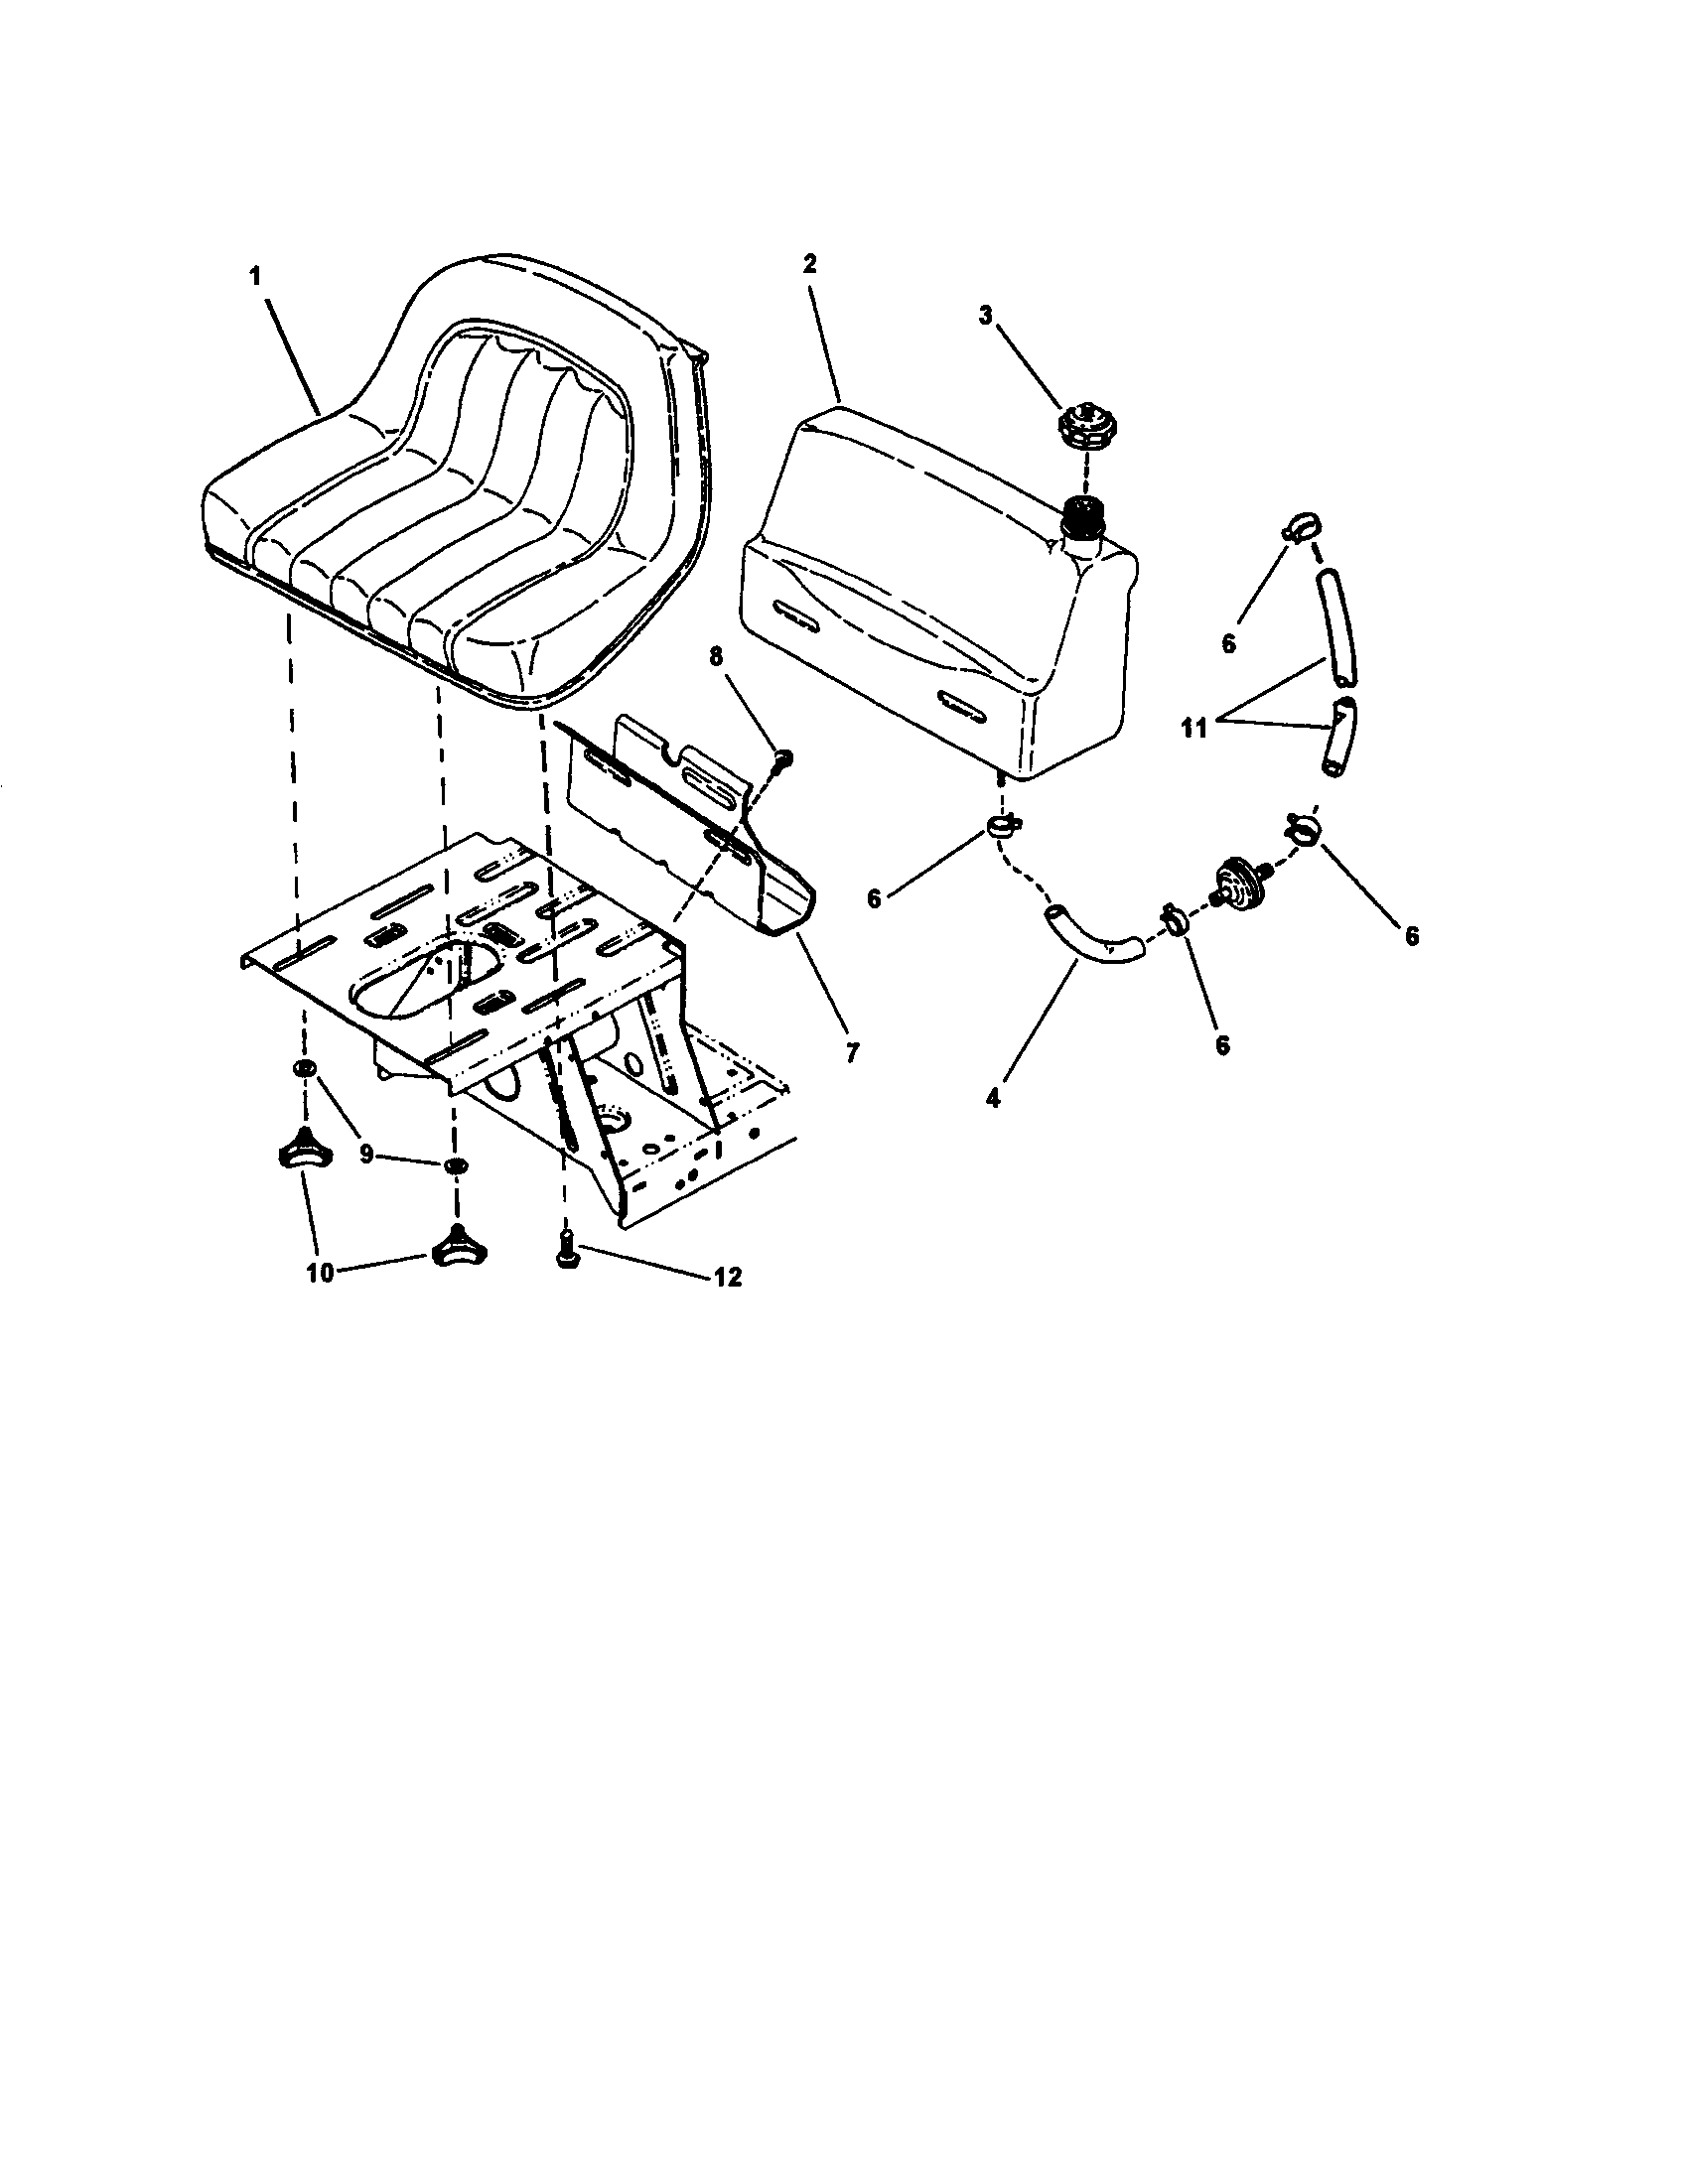 Snapper model M280919B lawn, riding mower rear engine